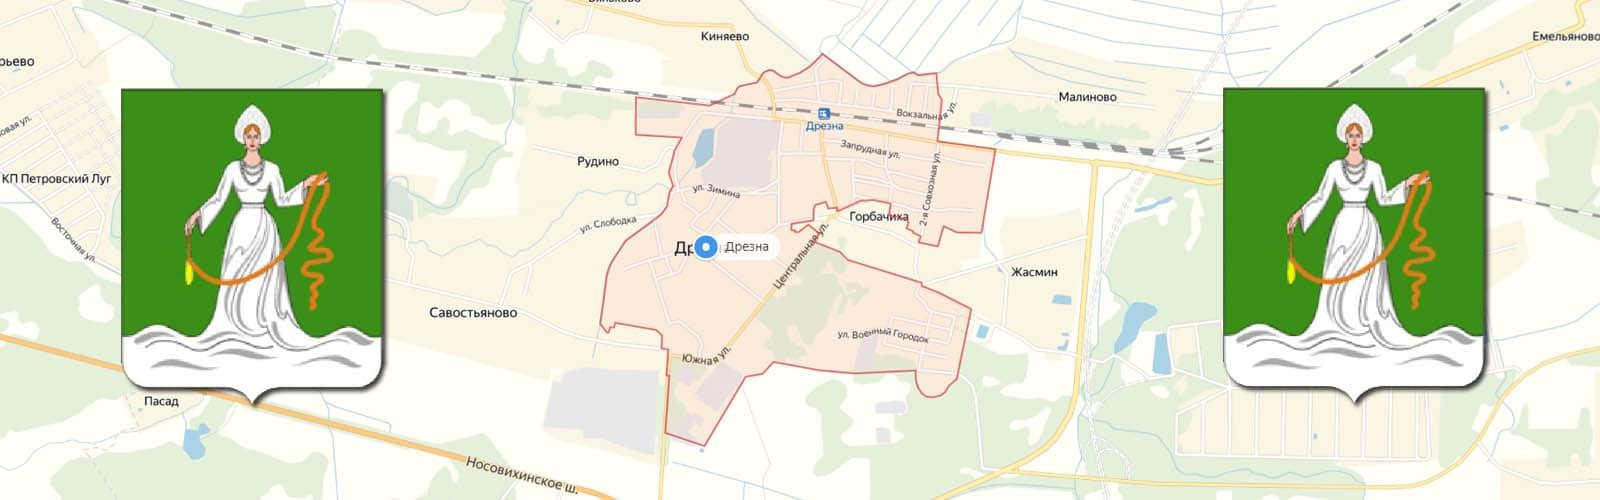 Дрезна